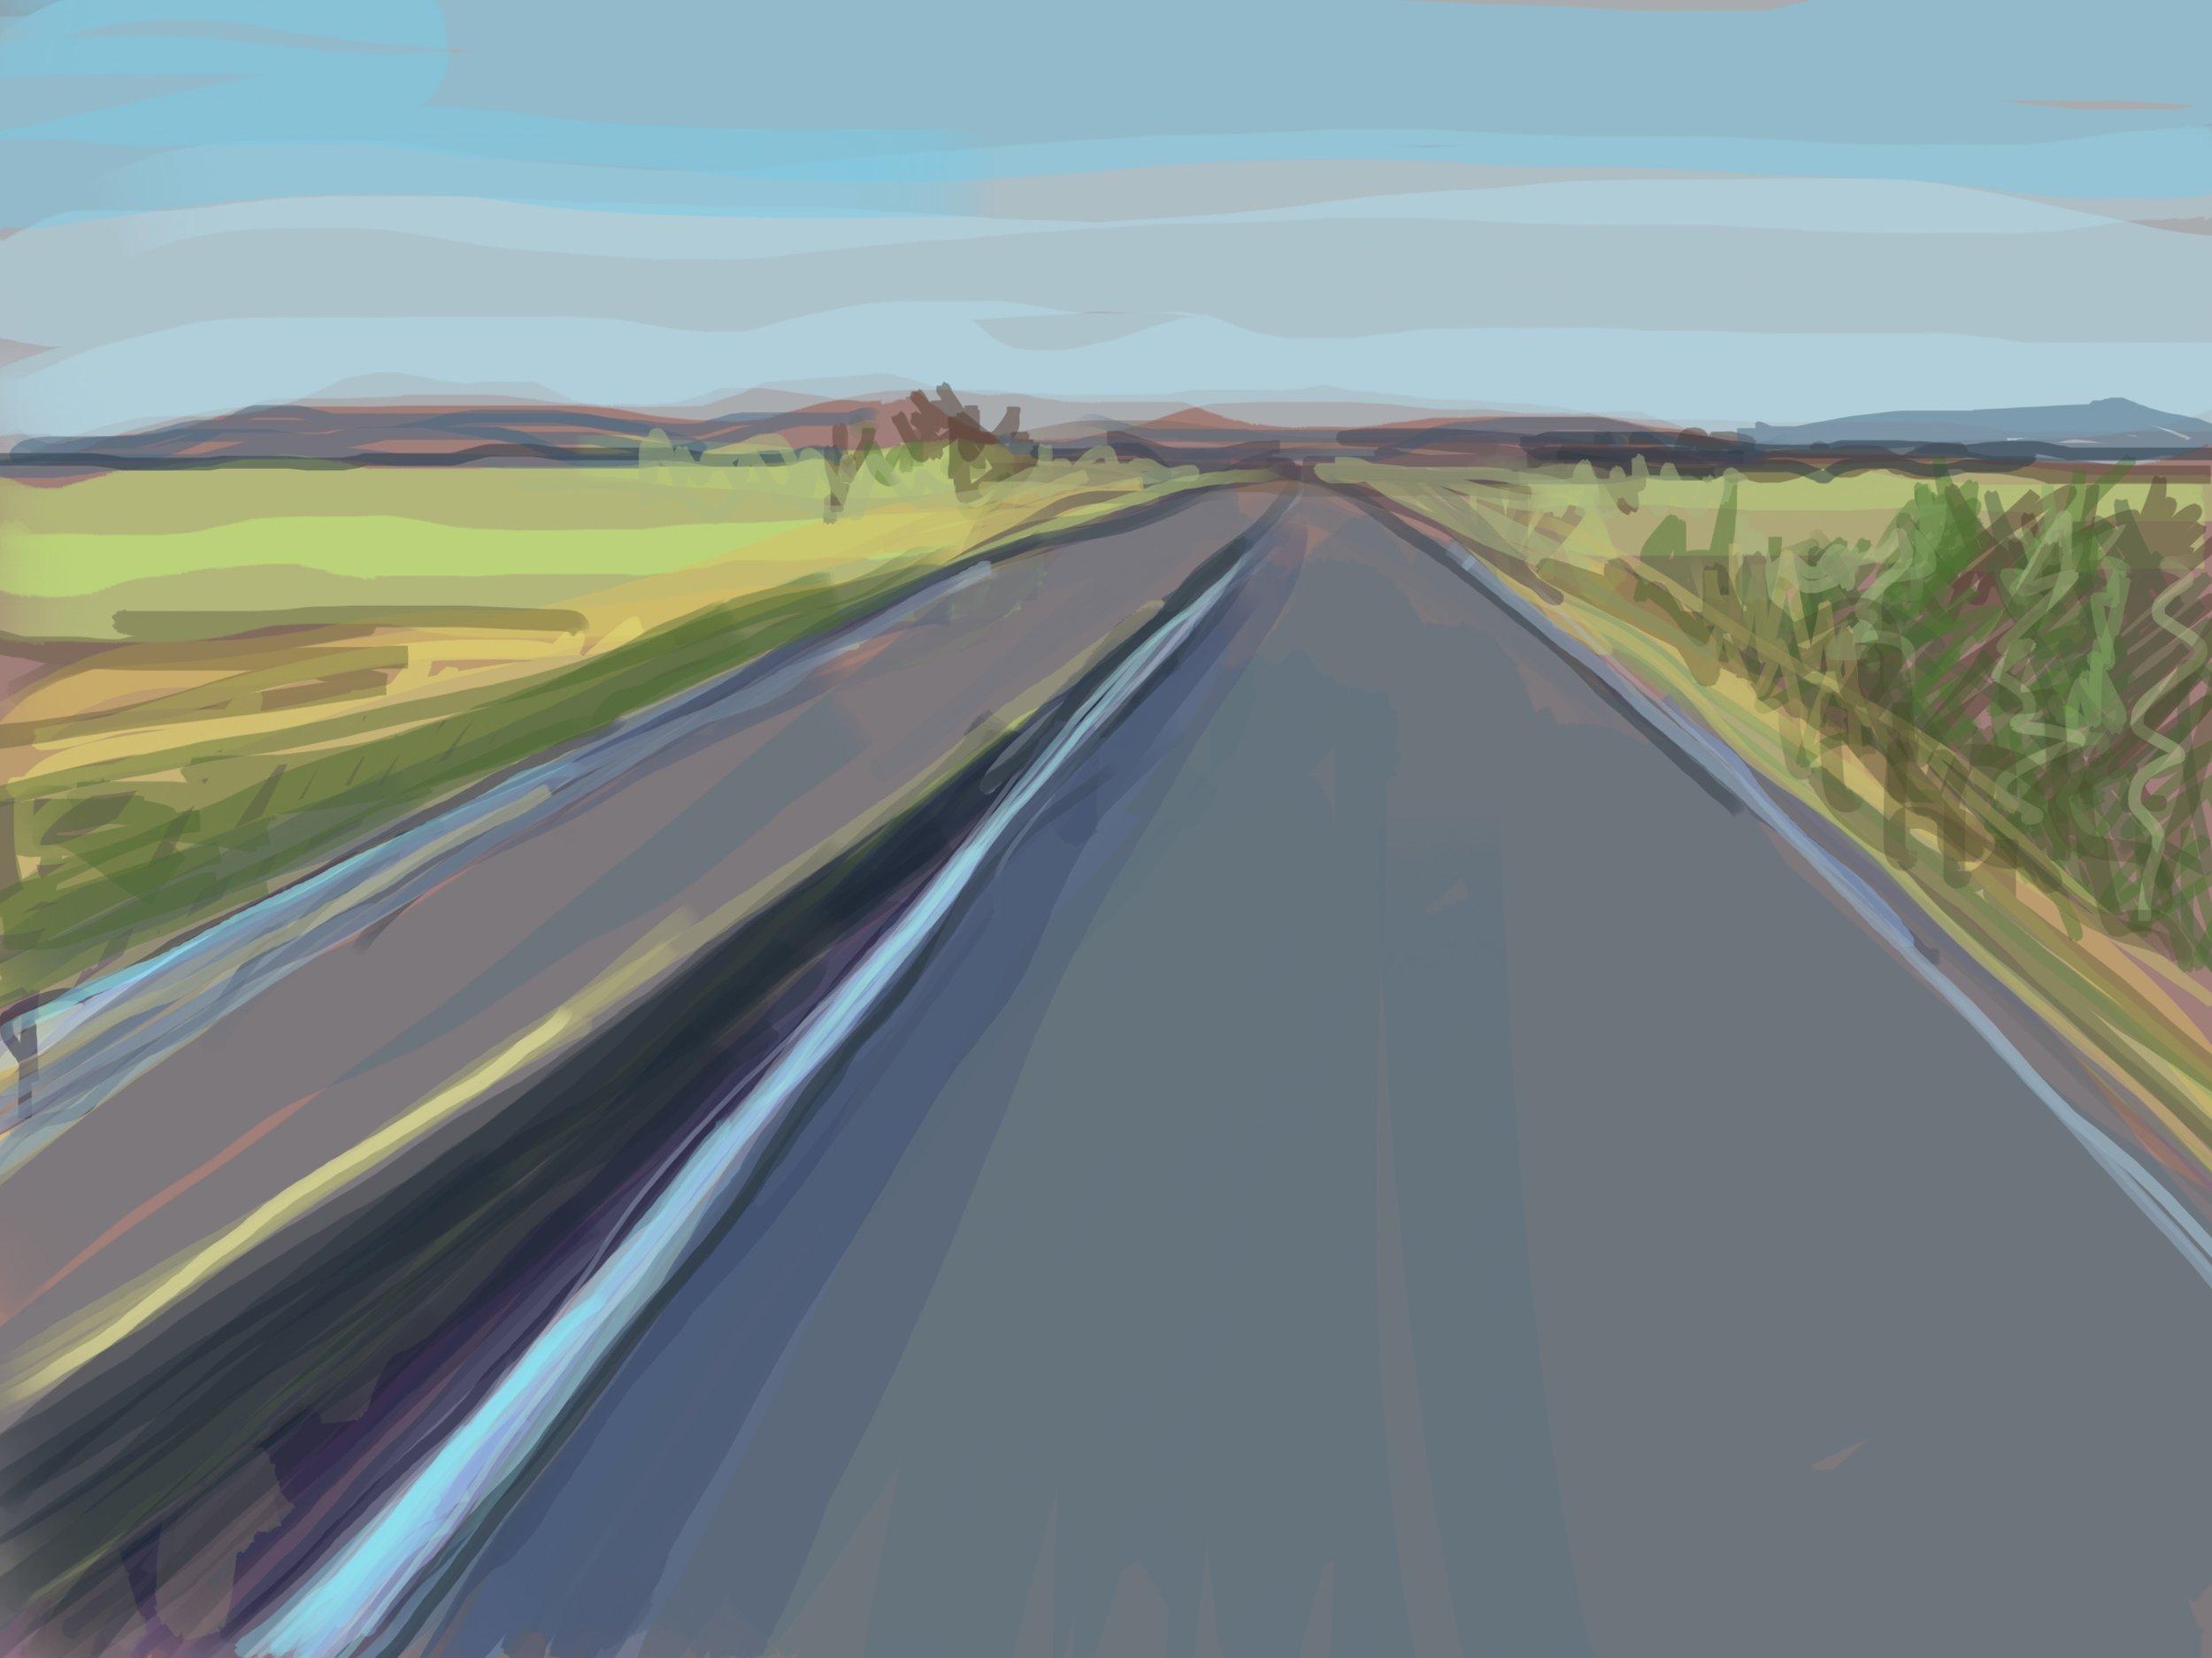 French Motorway Feb '19